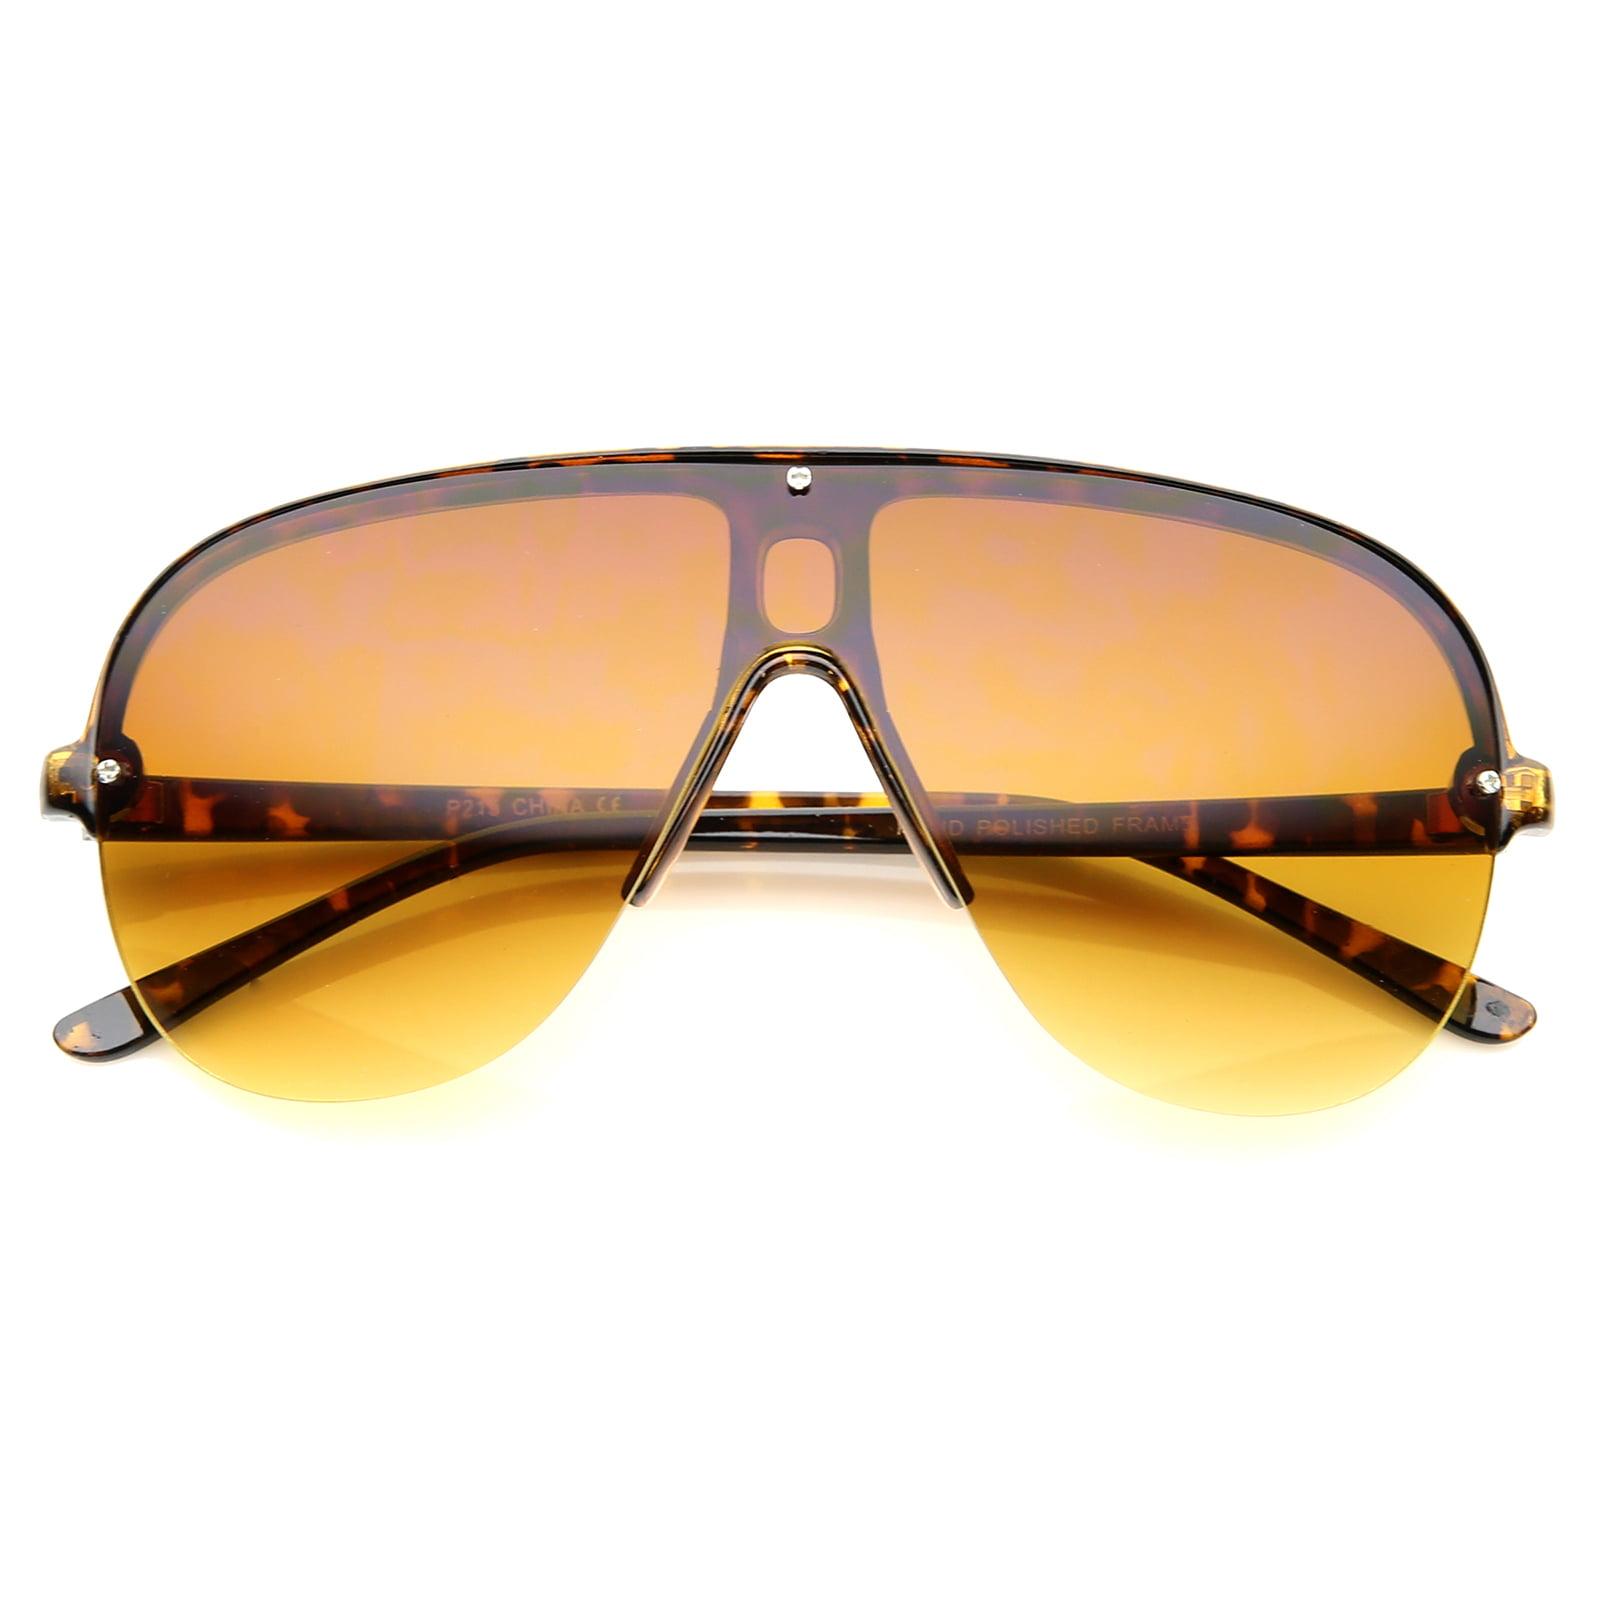 sunglassLA - Oversize Flat Top Semi-Rimless Frame Shield Aviator Sunglasses - 70mm